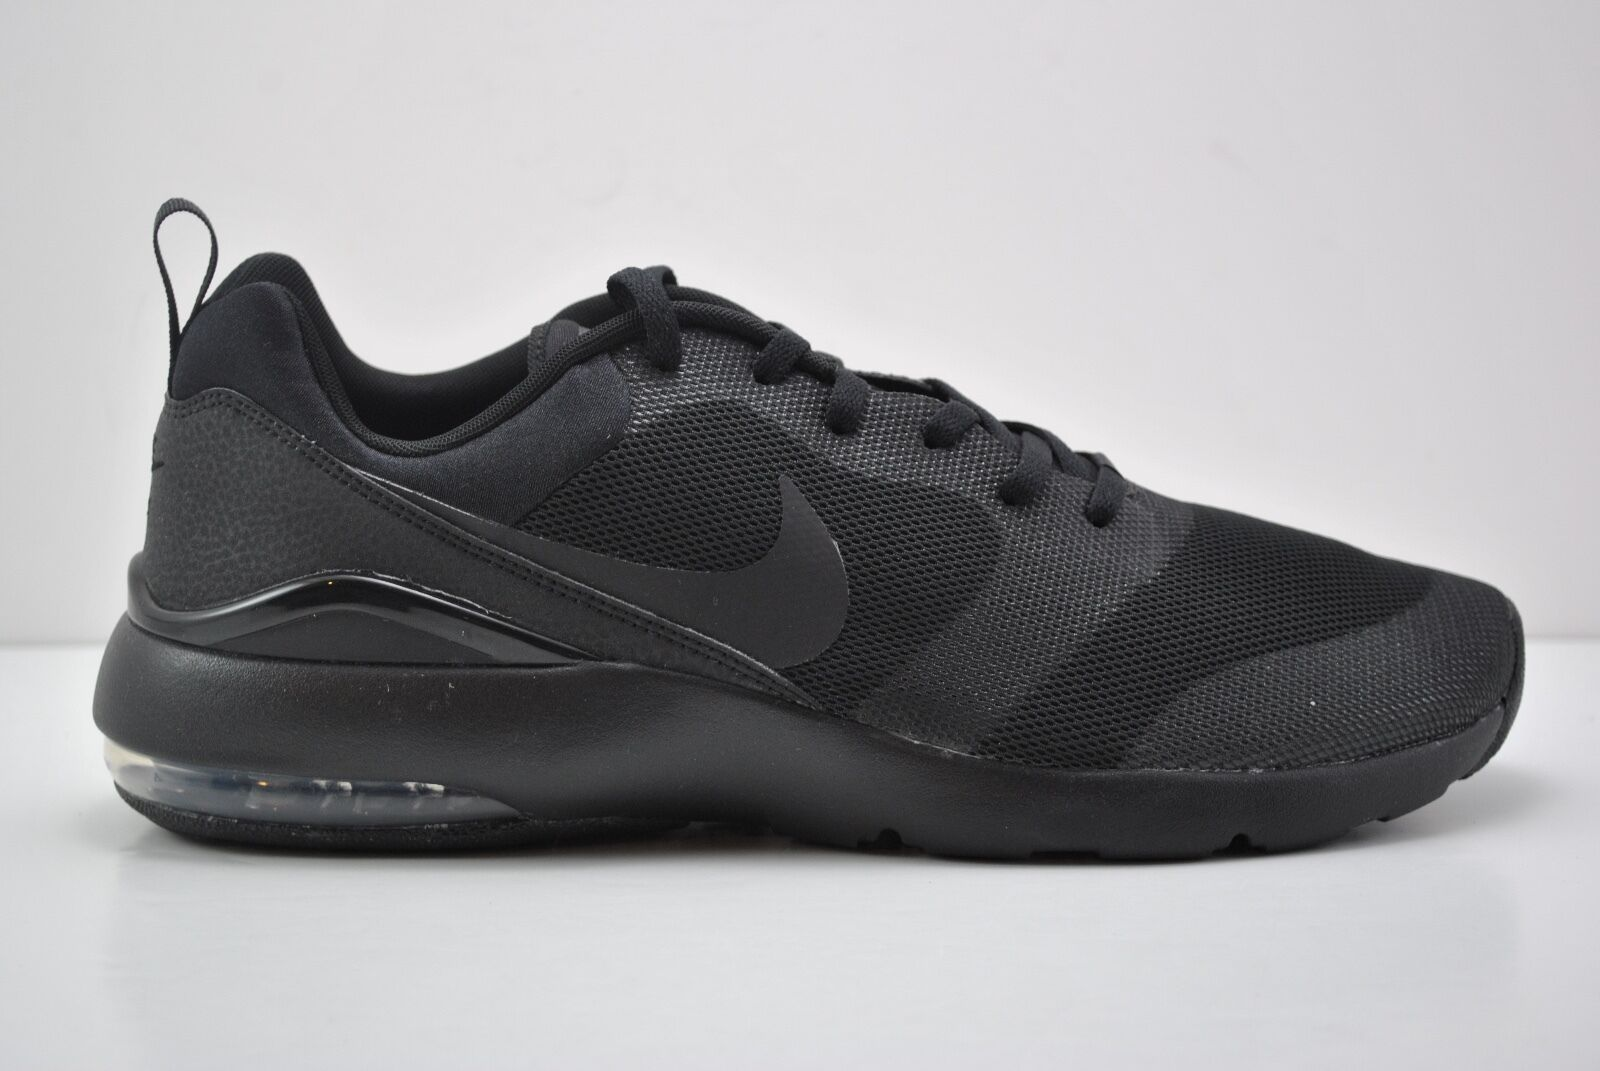 Mens Nike Air Max Siren Running Shoes Size 11 Black White 749765 001